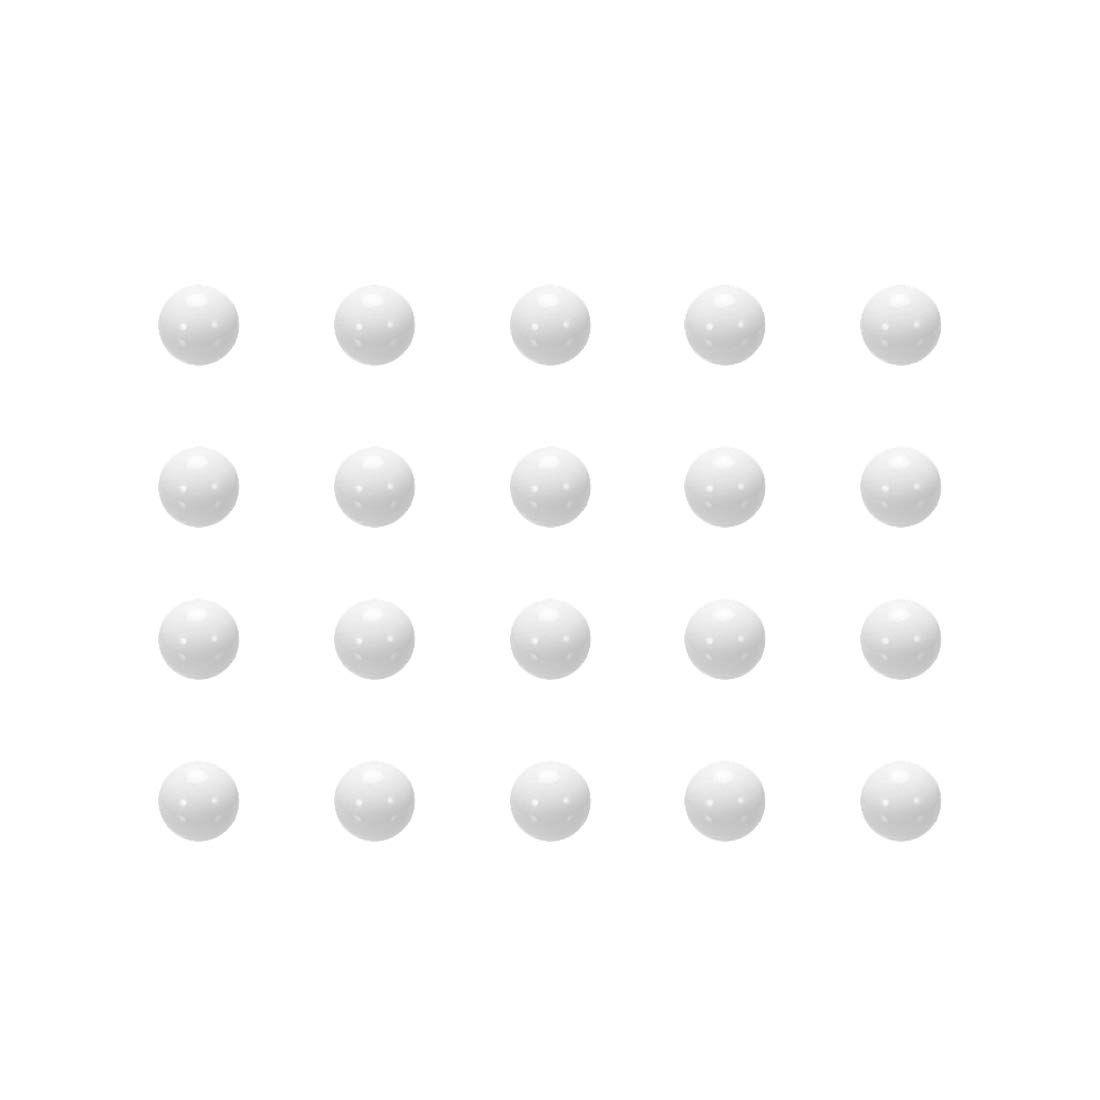 Sourcingmap Metric POM - Bolas de plástico para hacer anillos de moneda, 4.5mm 100Qty, 1